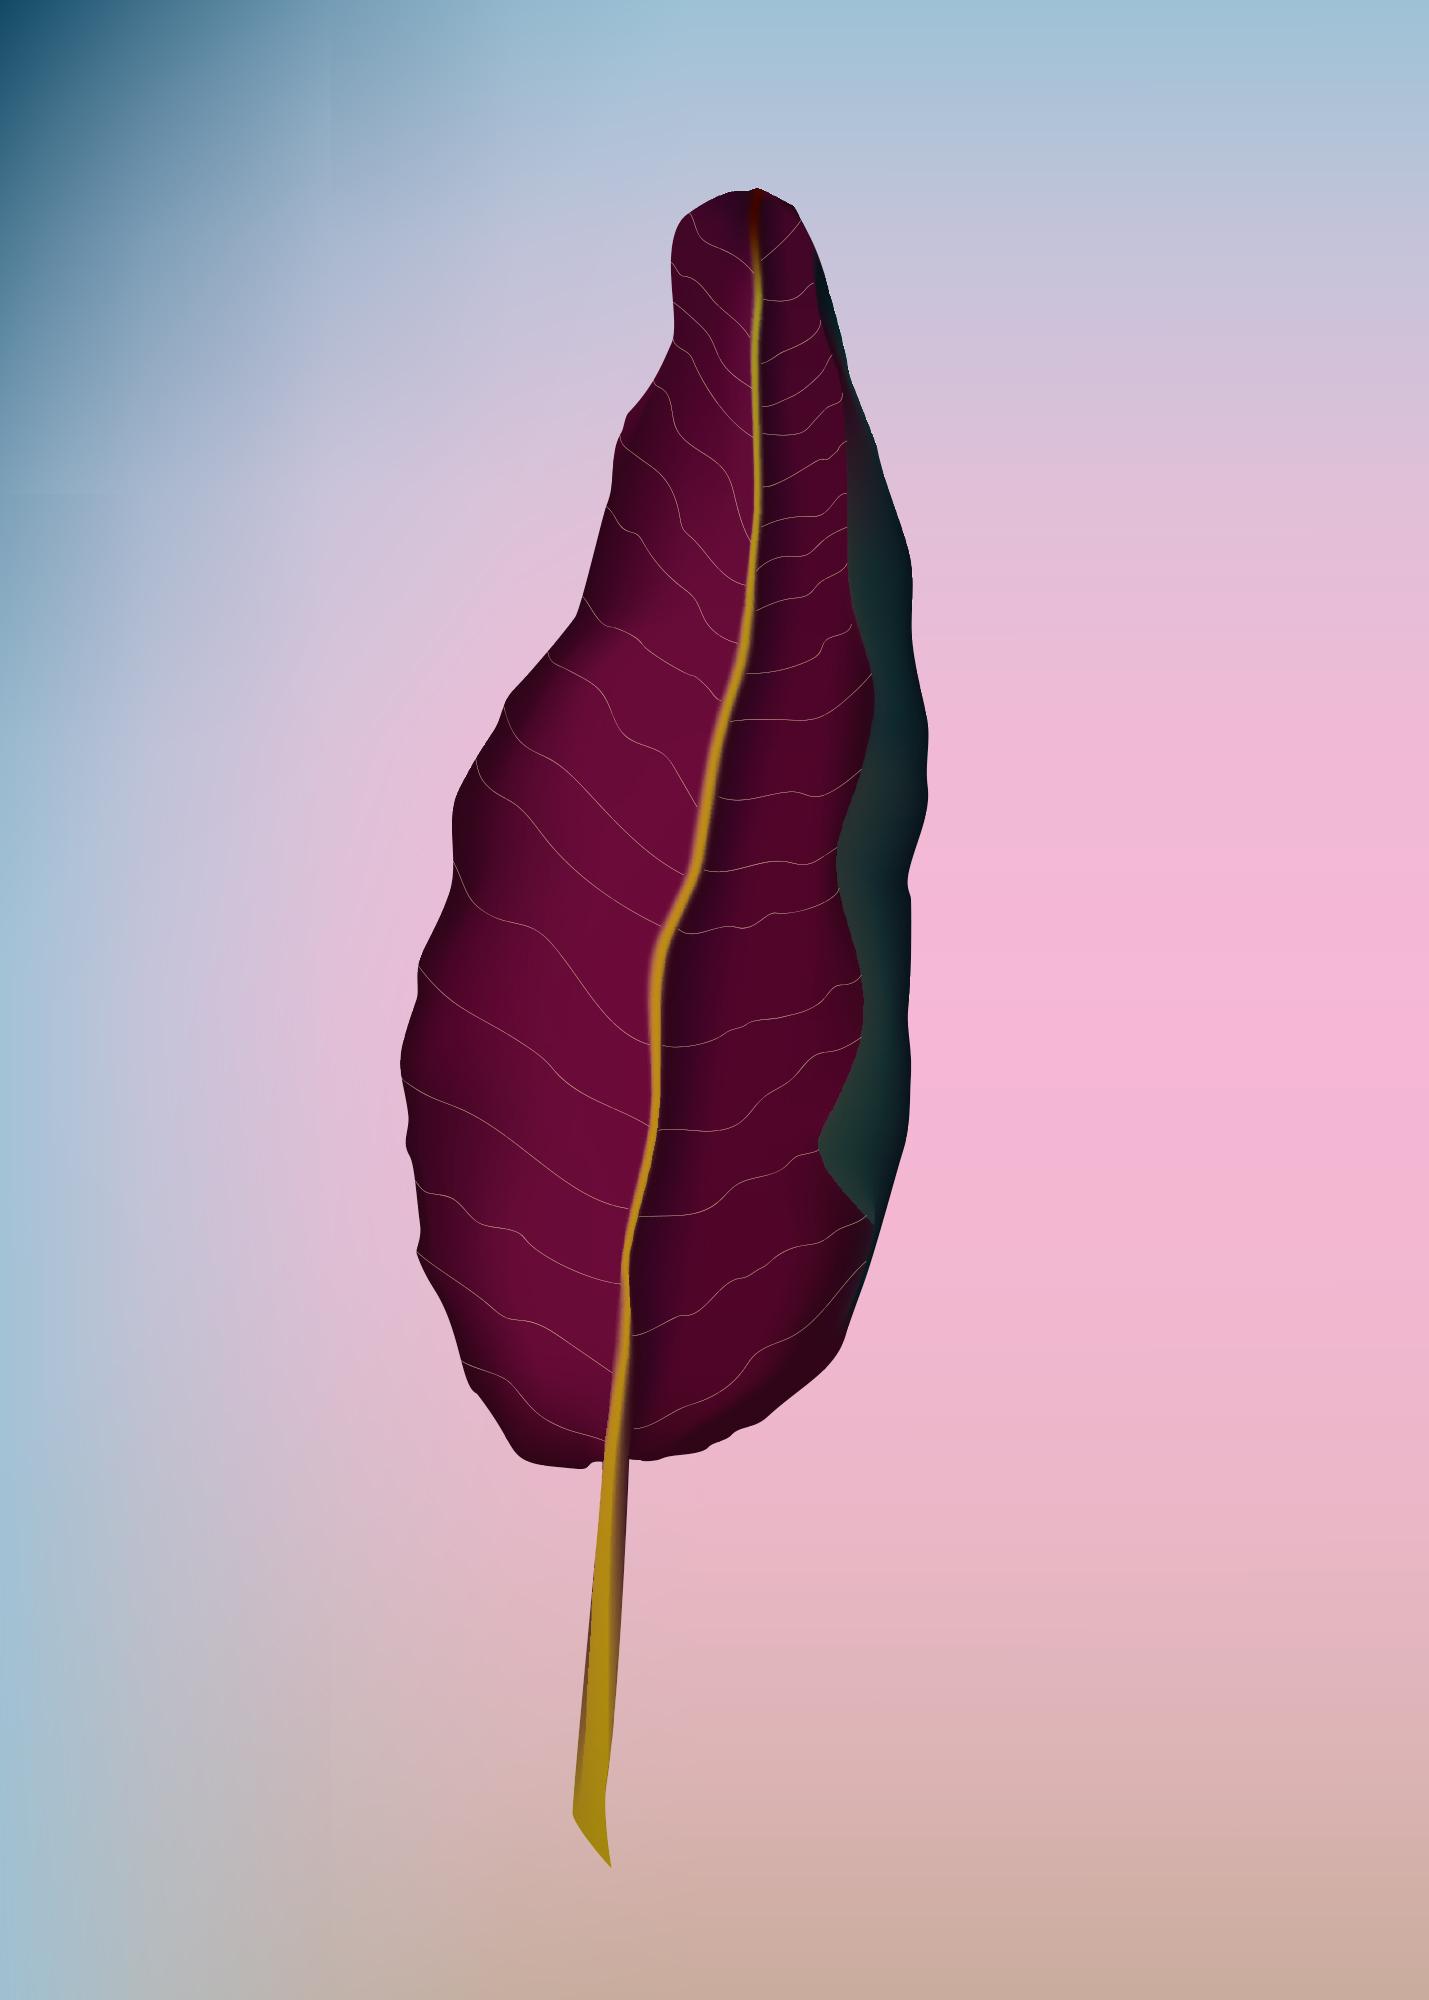 Calathea roseopicta (Pfeilwurzelgewächs), Irene Szankowsky